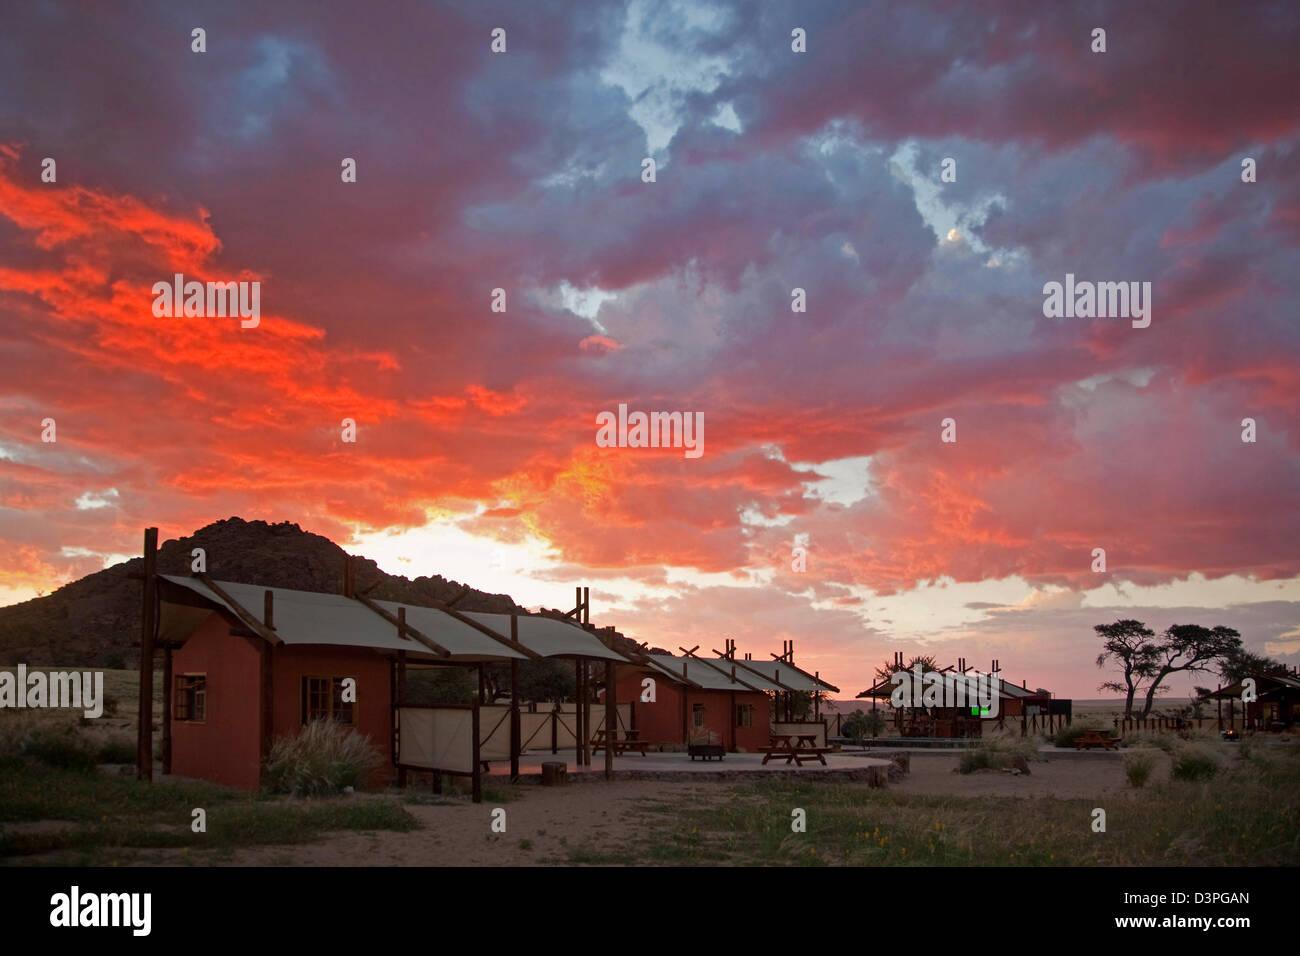 Campamento desierto Lodges at Sunset, Namib-Naukluft cerca de Sossusvlei, Namibia, Sudáfrica Imagen De Stock